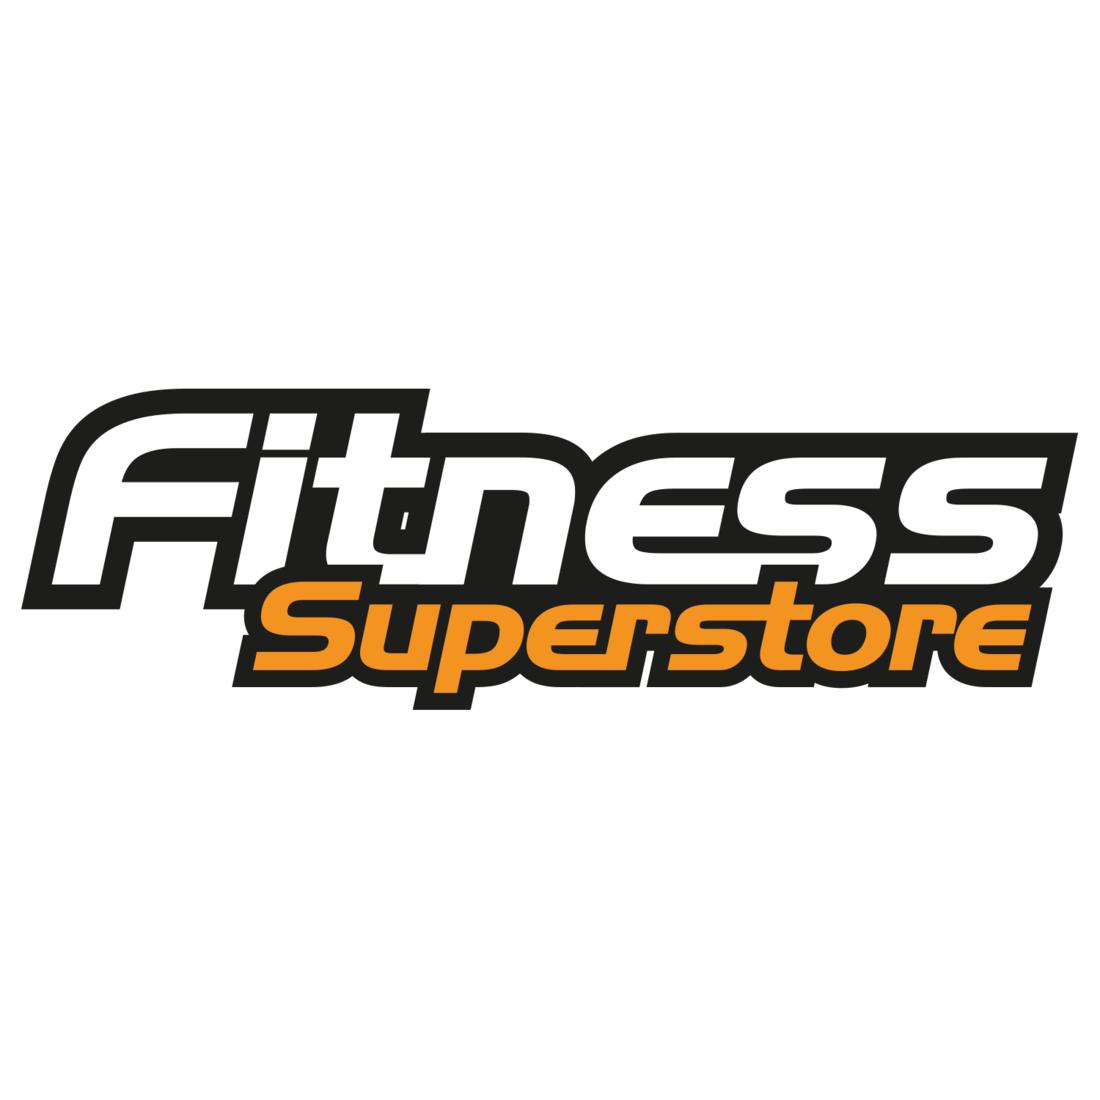 [img]https://www.fitness-superstore.co.uk/media/catalog/product/cache/1/image/900x/9df78eab33525d08d6e5fb8d27136e95/1/5/15328_0_1.jpg[/img]